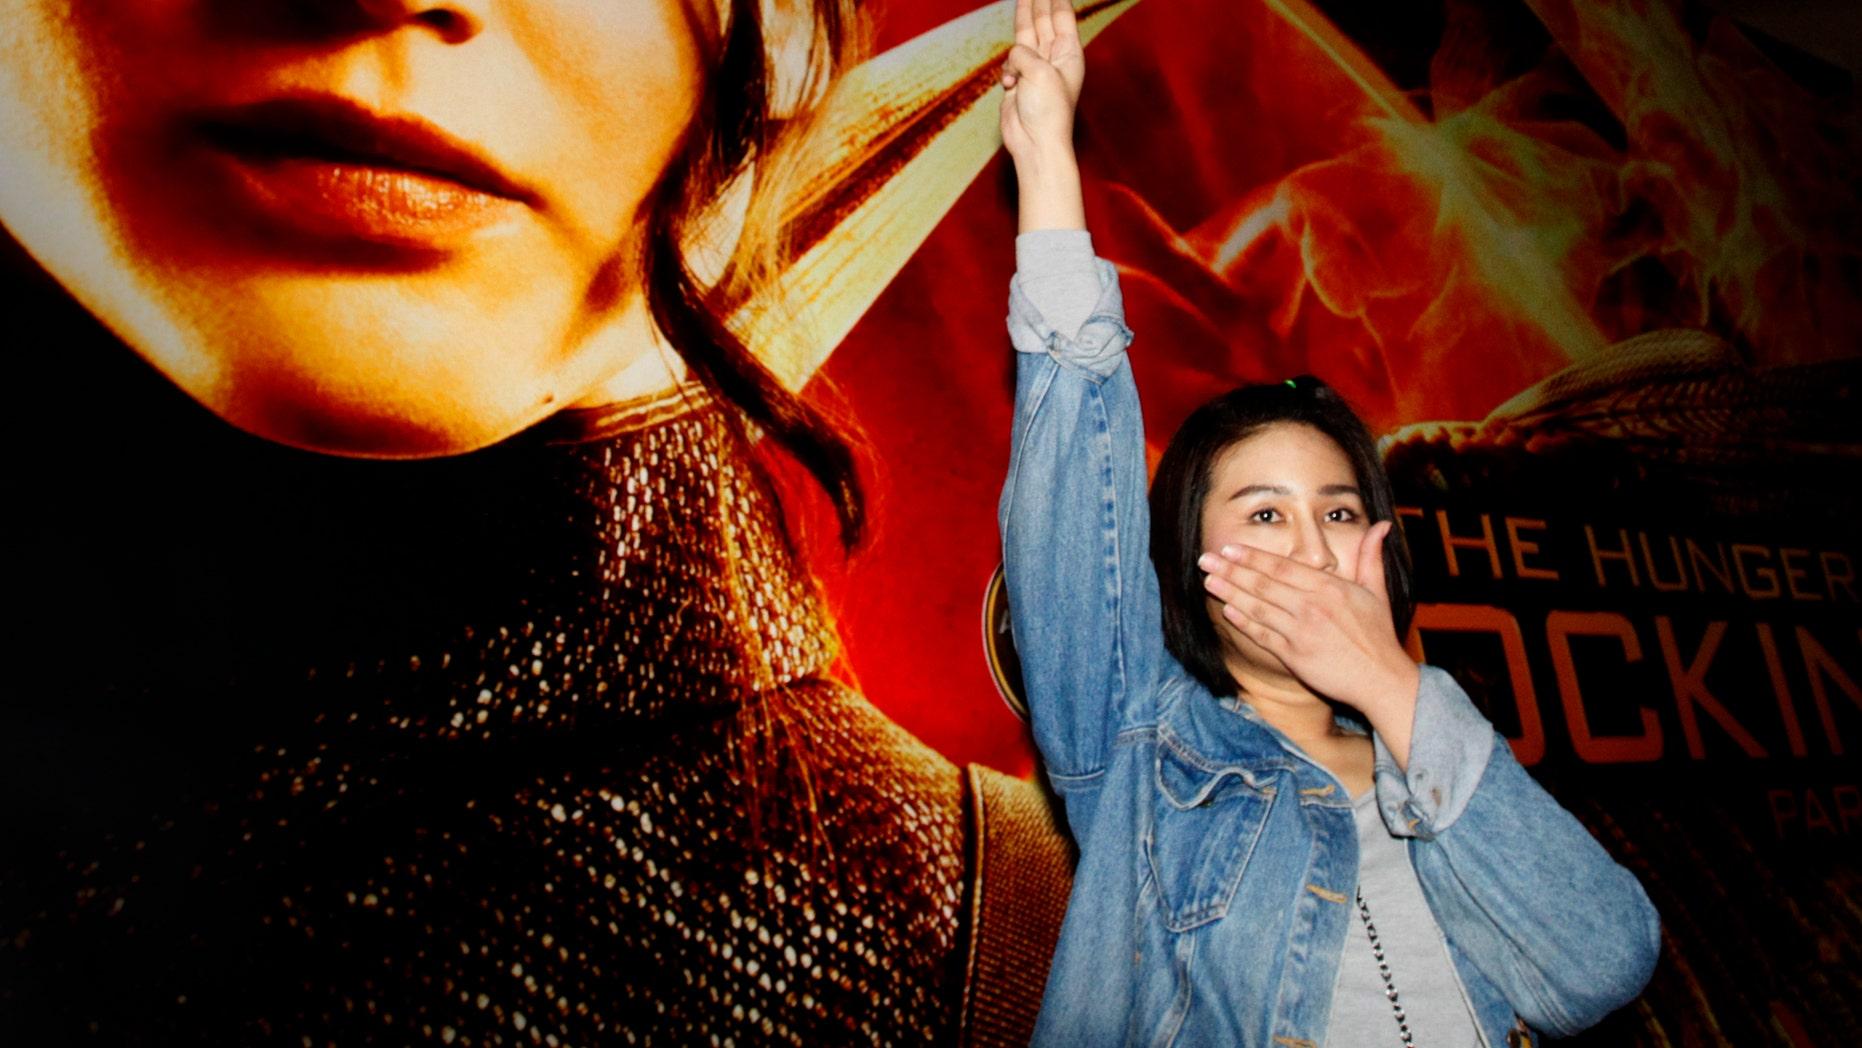 "Nov. 20, 2014: Nachacha Kongudom, 21, raises a three-finger salute outside a cinema where ""The Hunger Games: Mockingjay - Part 1"" is showing, in Bangkok, Thailand"